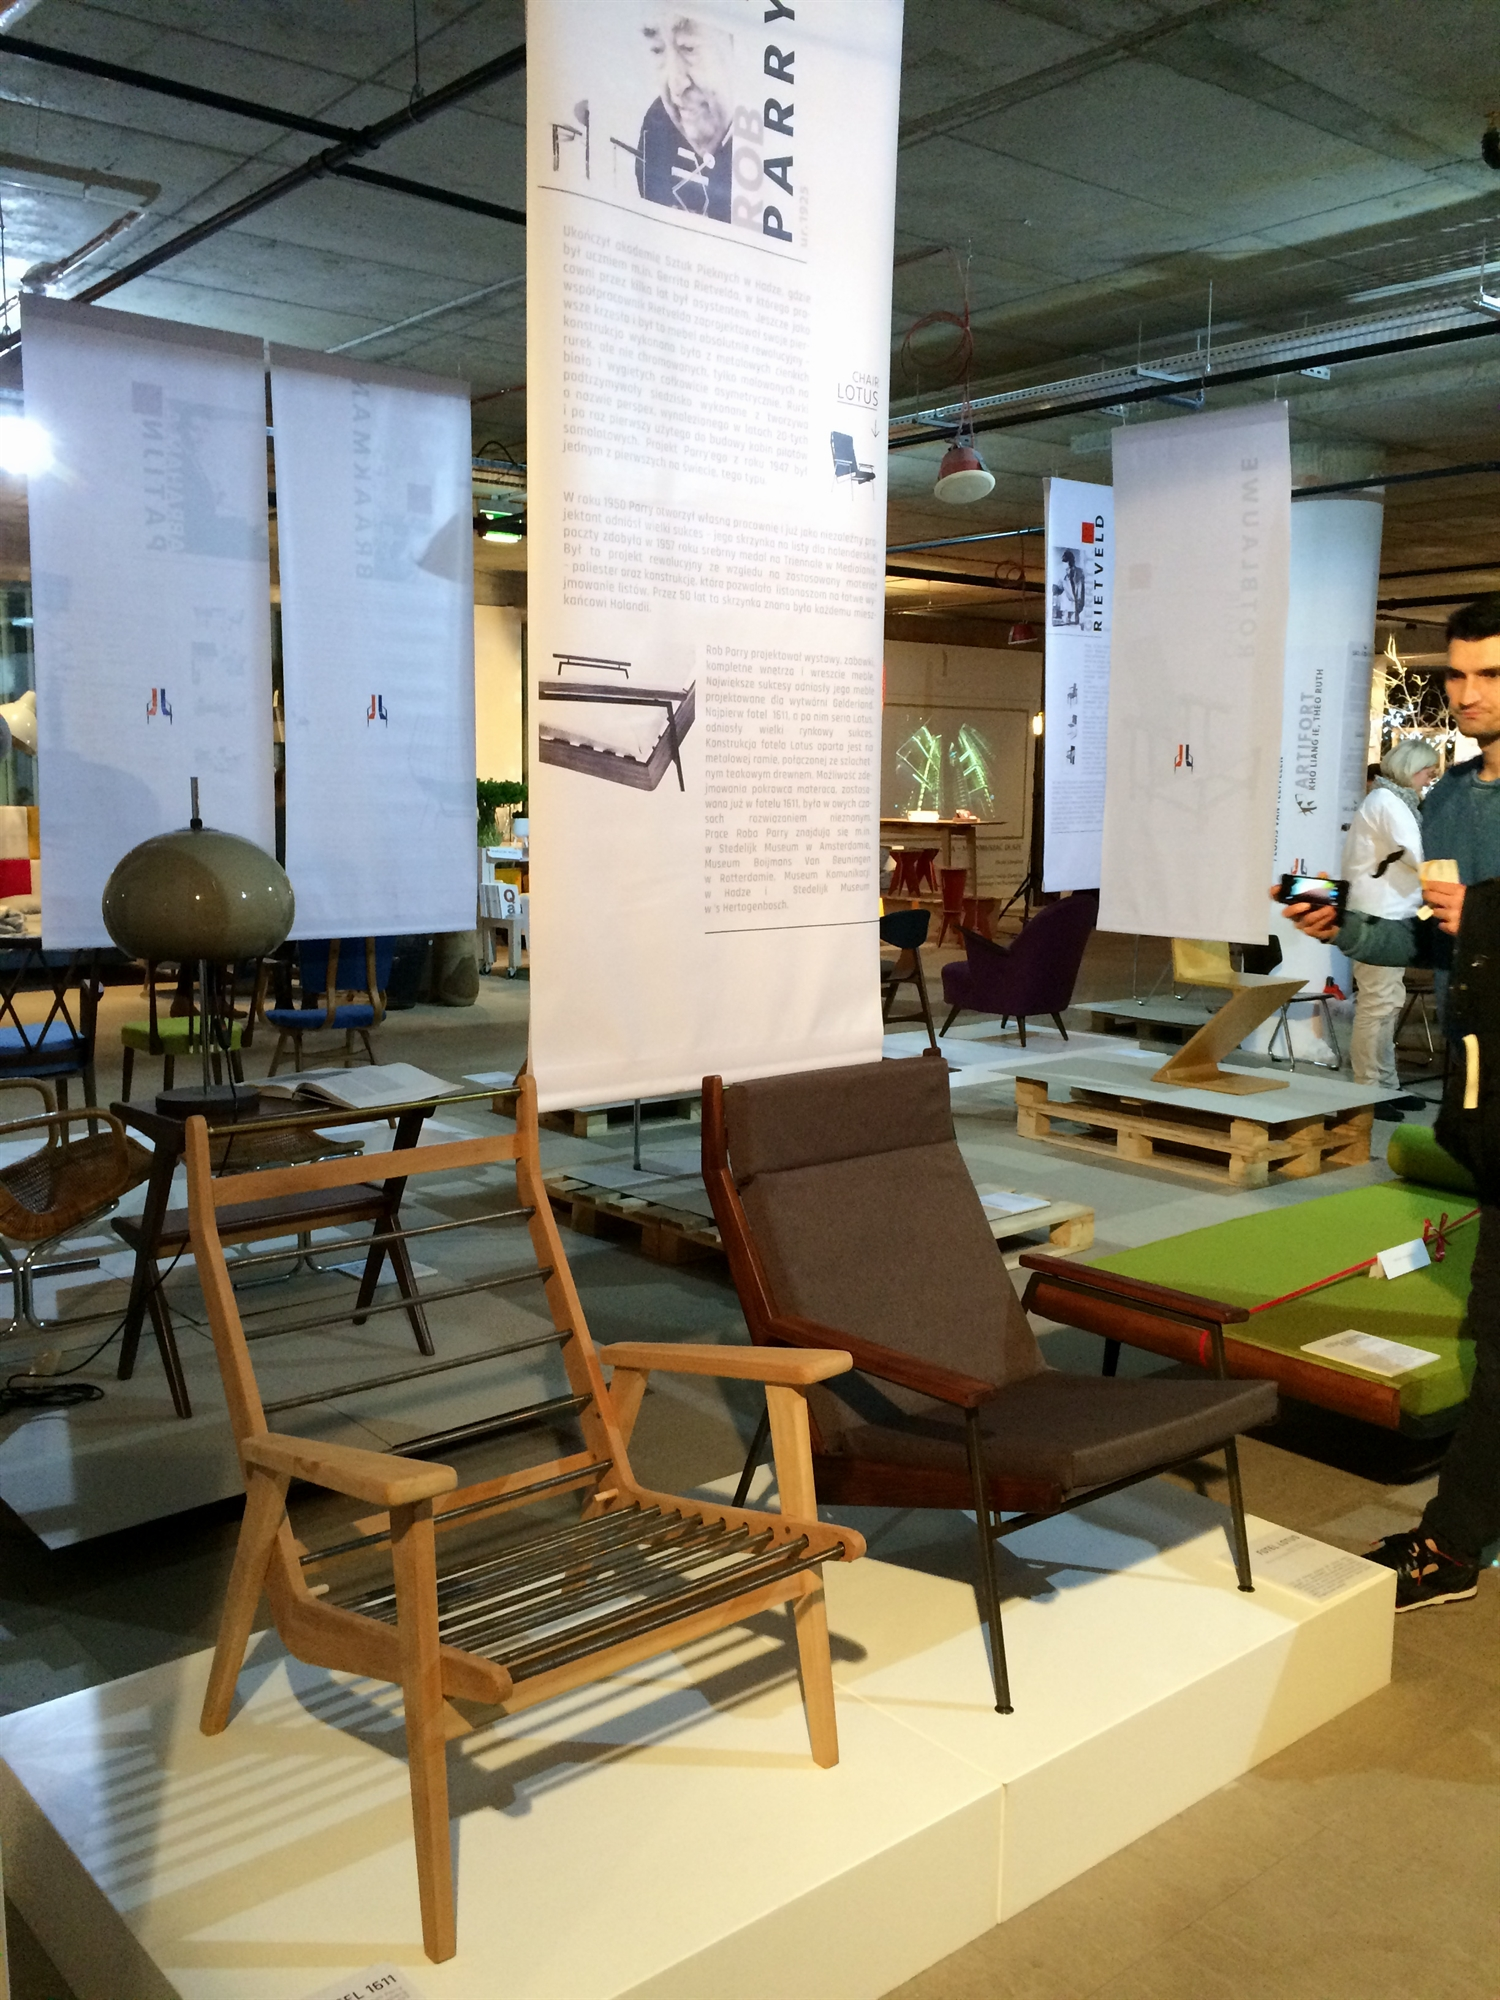 4 targi_rzeczy_ladnych_best_polish_design_fair_pretty_things_interior_design_home_decorating_ideas_modern_furniture_vintage_style_apartment_polskie_projekty_nowoczesne_mieszkanie_forelements_blog